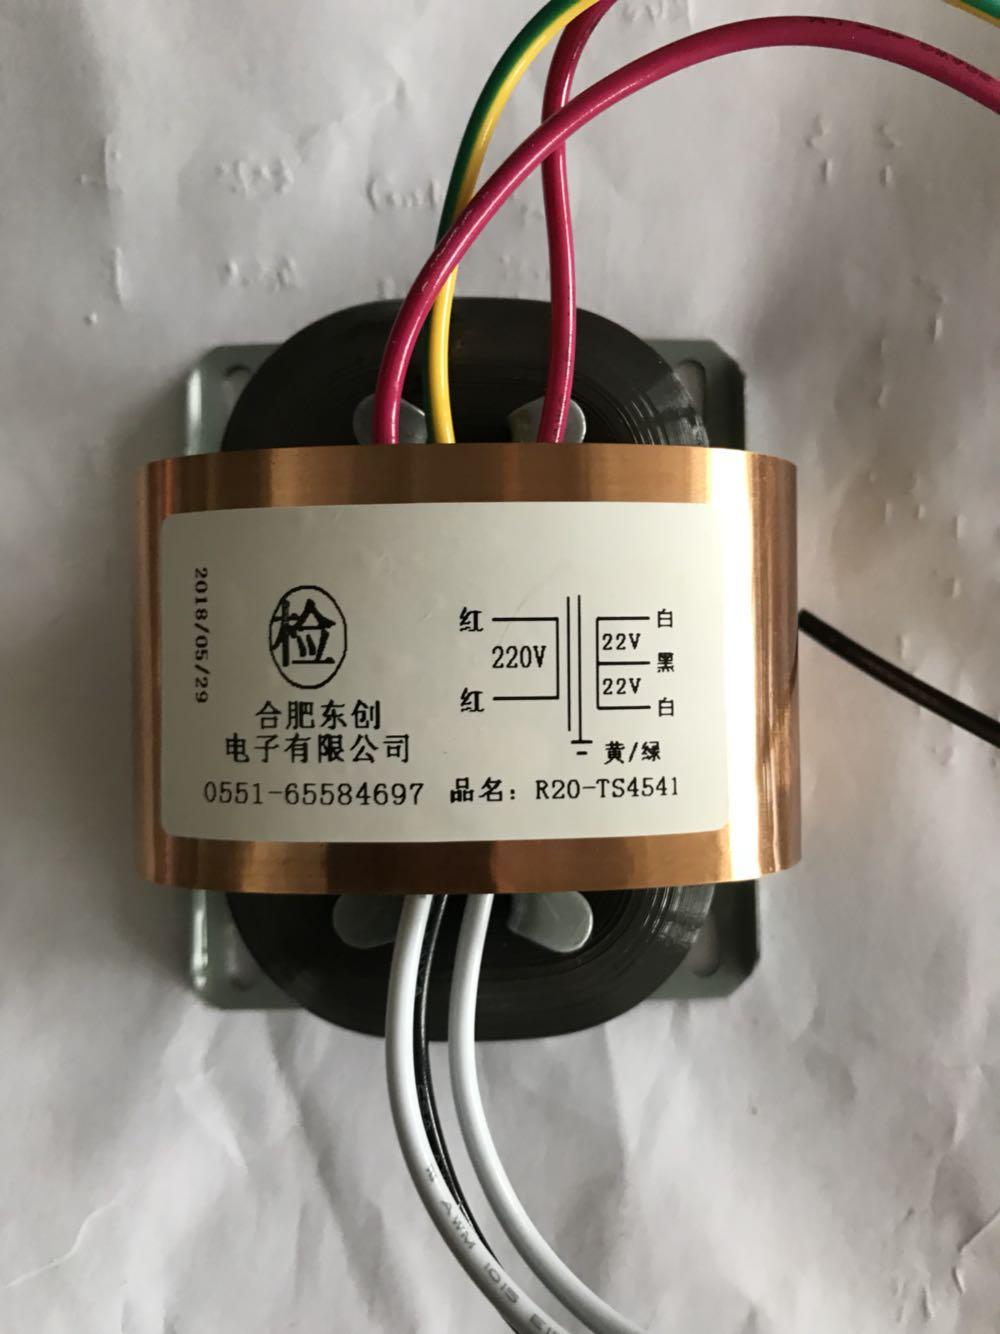 22V-0-22V 0.68A Transformer R Core R20 custom transformer 220V 30VA copper shield for DAC pre-amplifier HIFI decoder 2500pcs zmm22v ll 34 zmm 22v 1 2w 1206 22v 0 5w smd